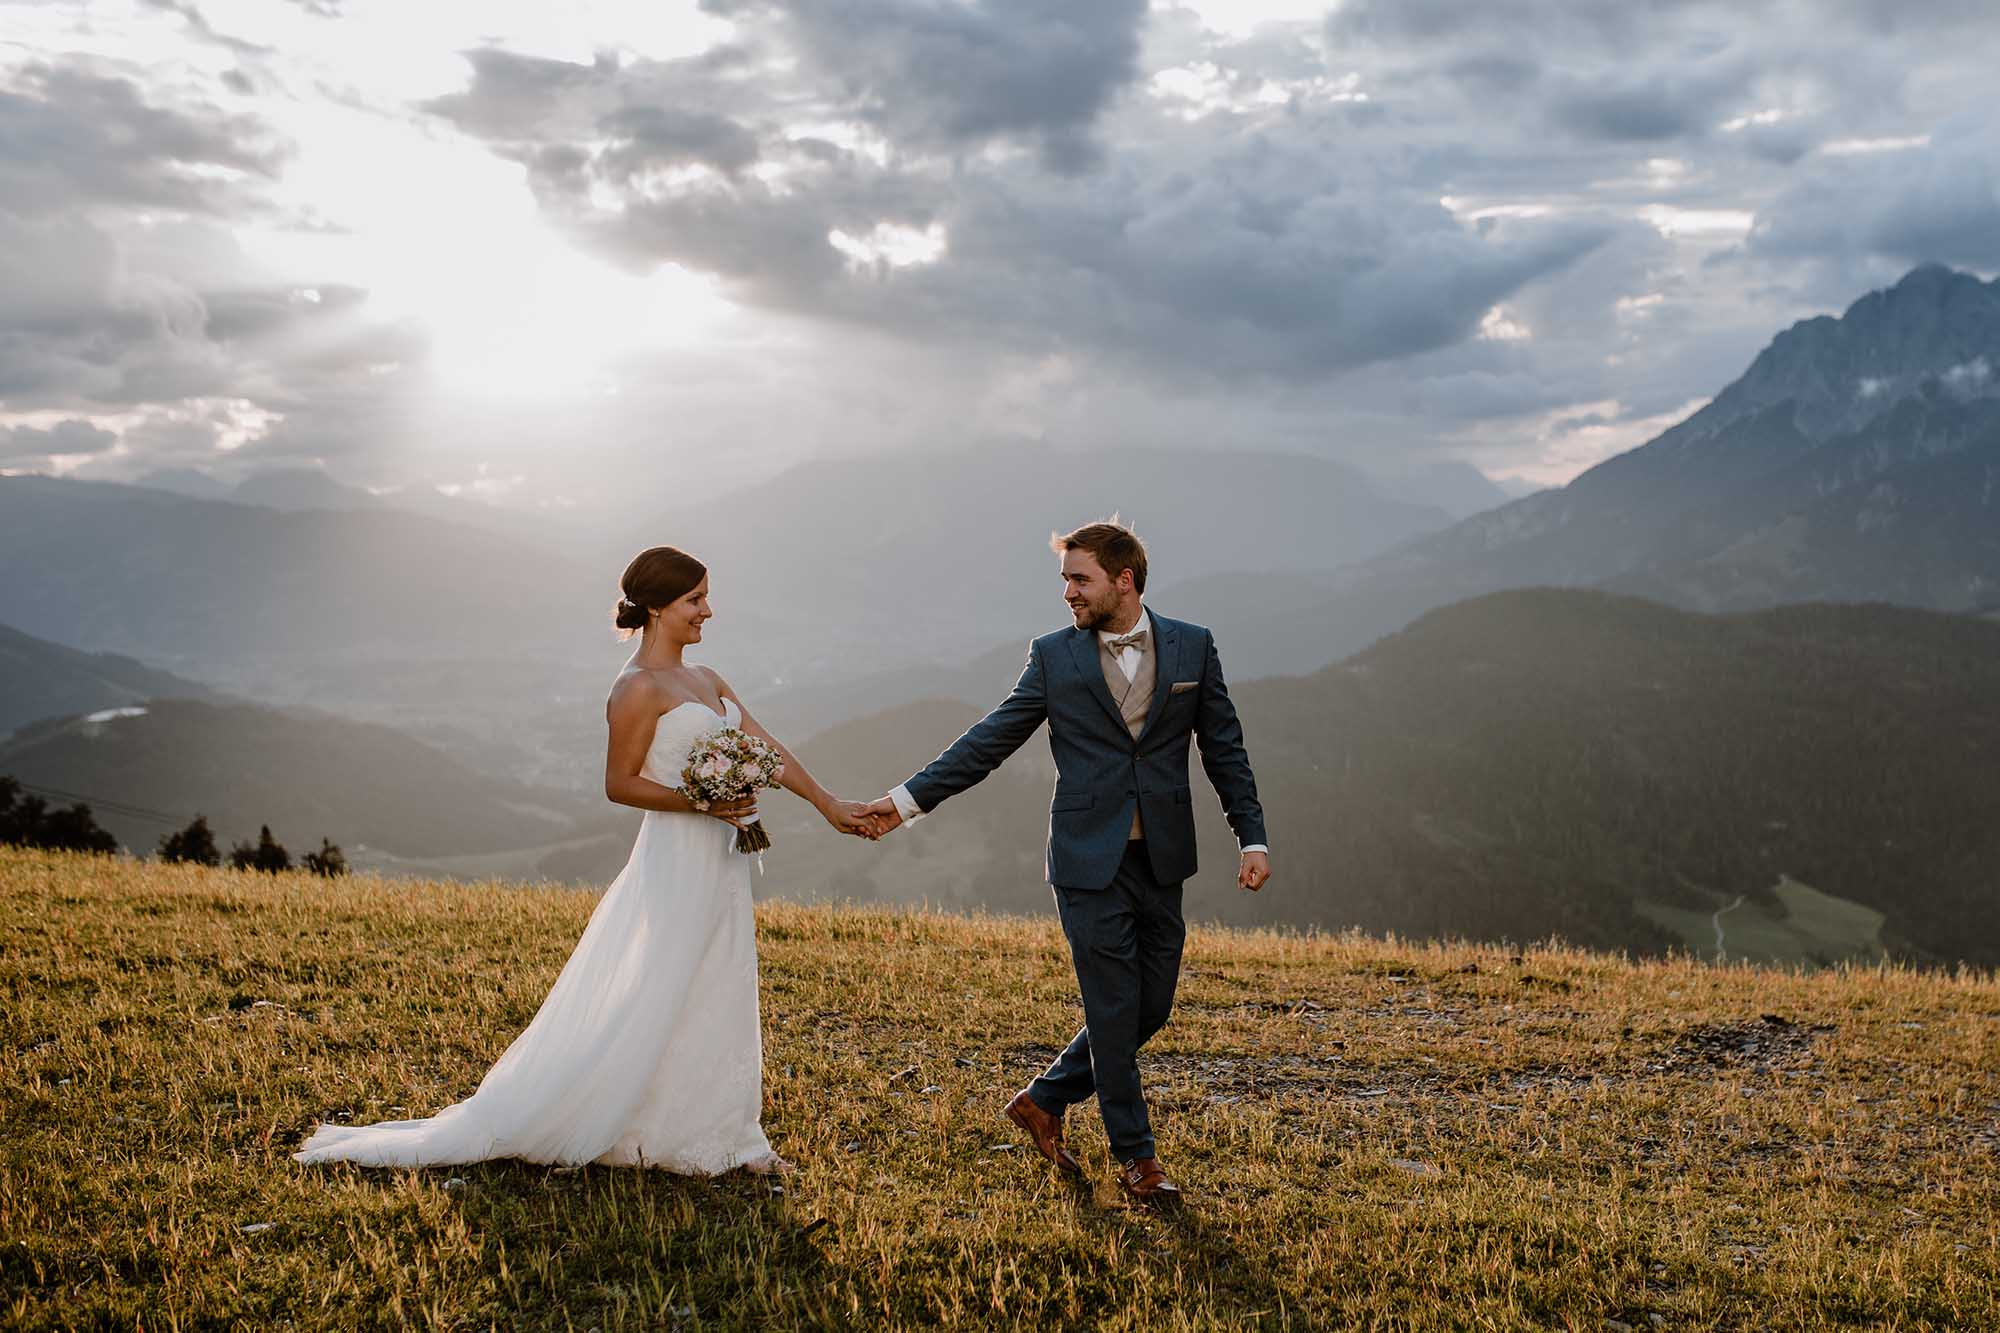 neli fotografie | Hochzeitsfotografin